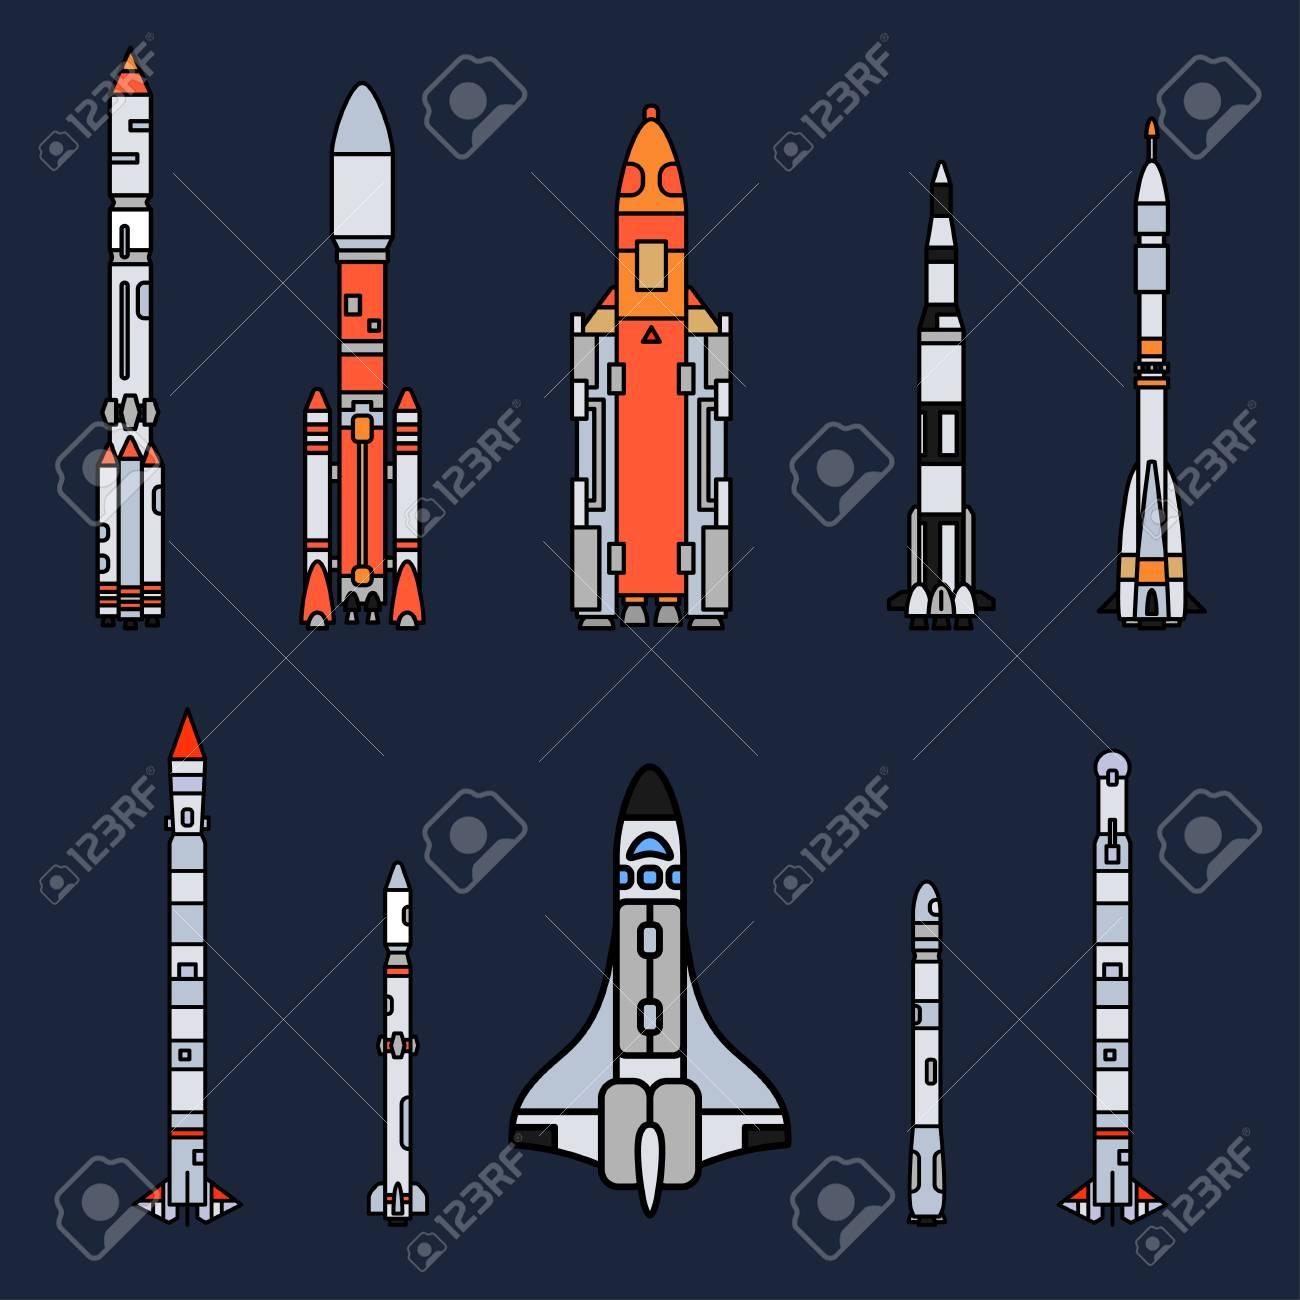 Multistage rocket